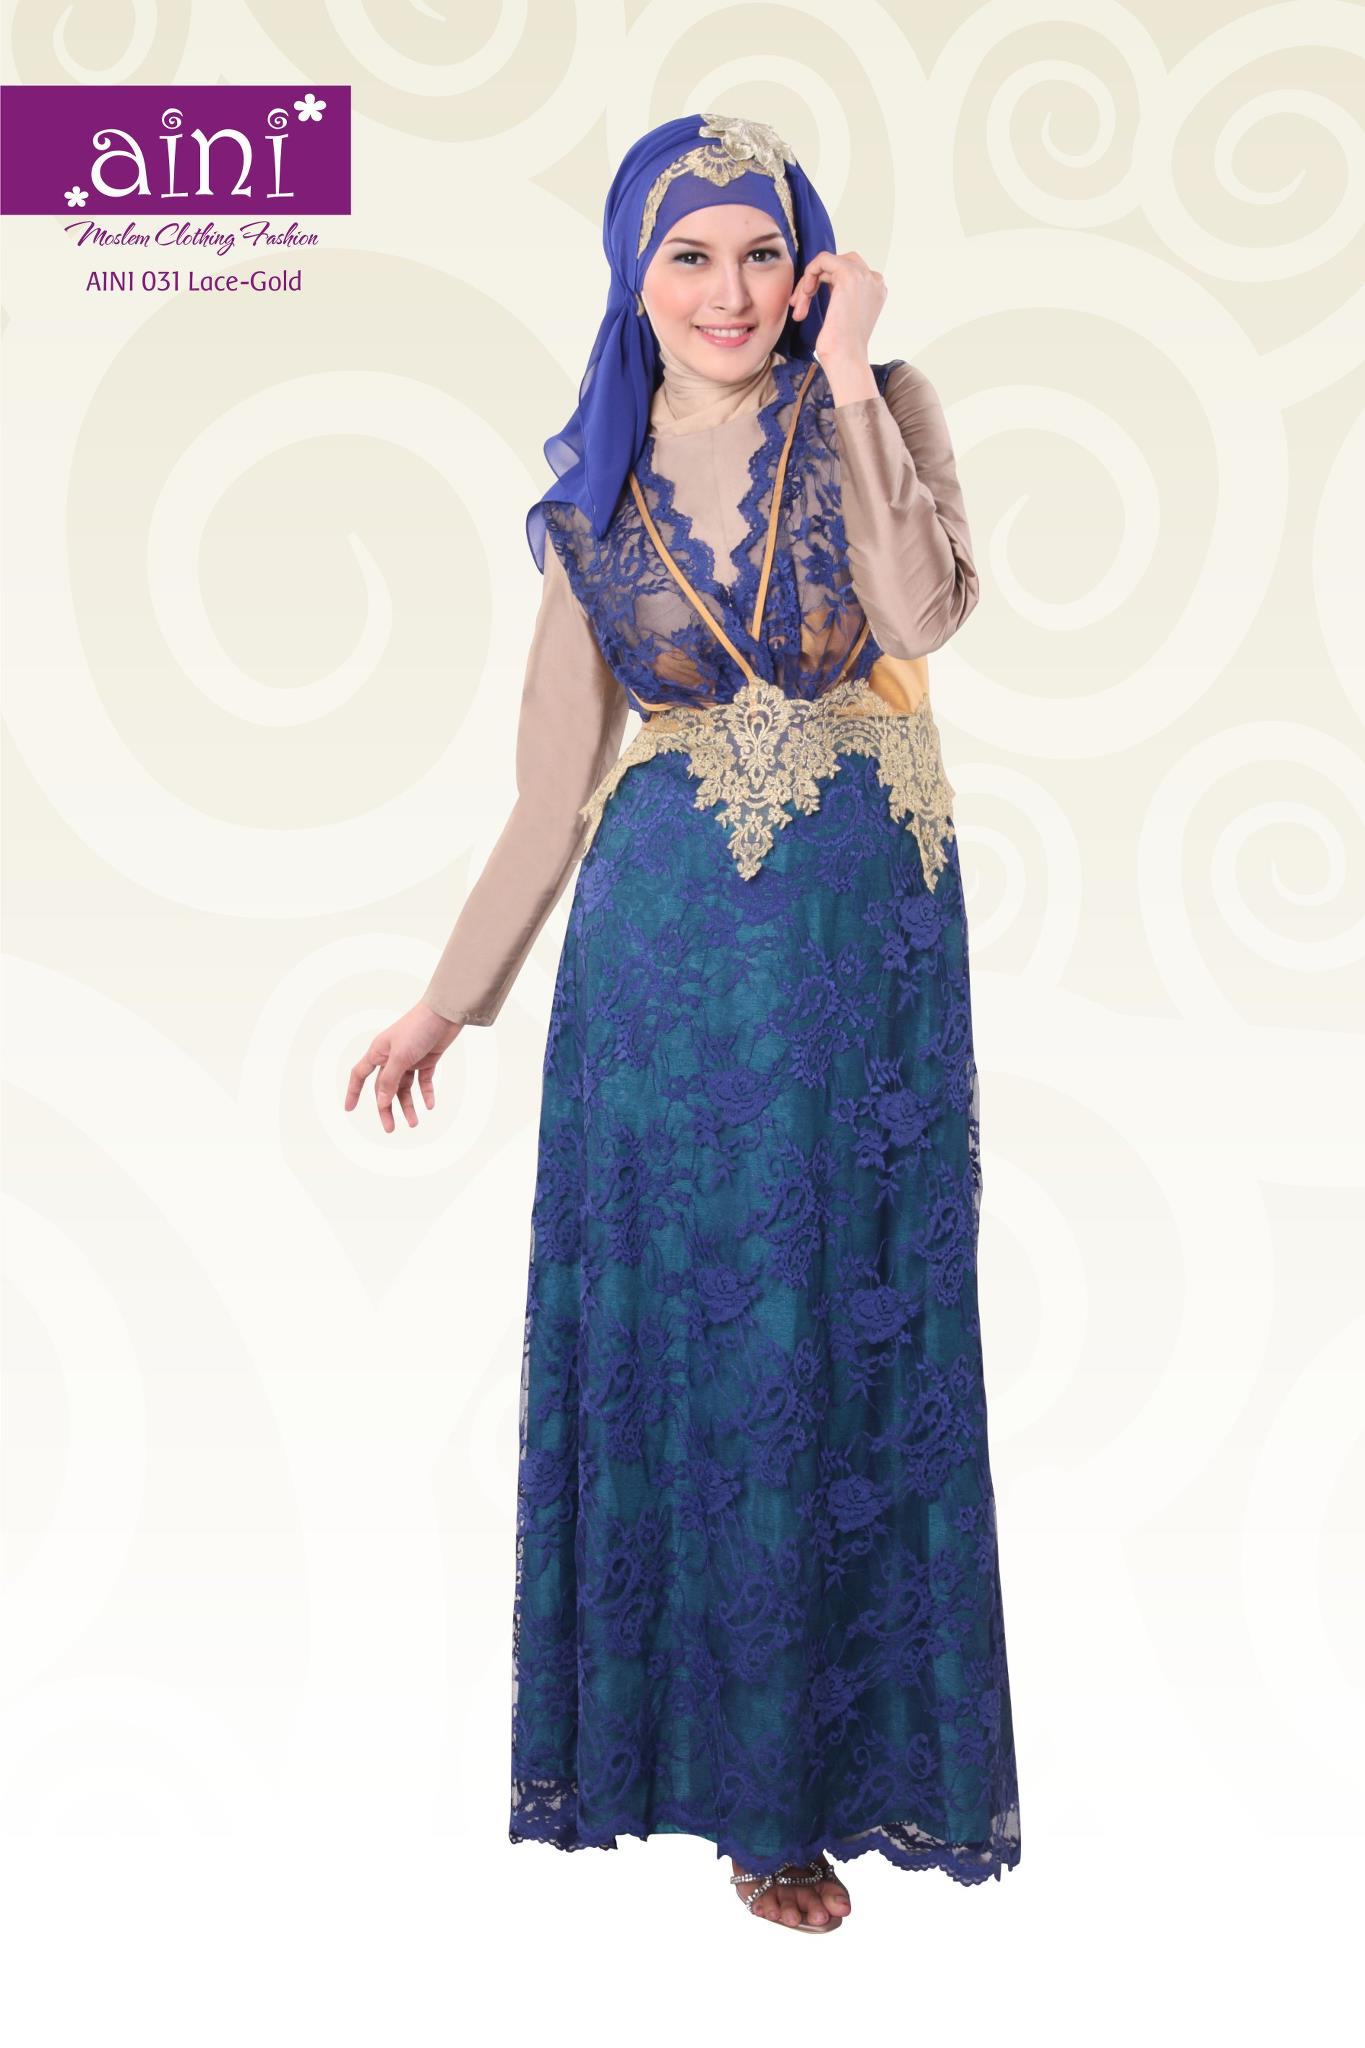 Aini 031 Baju Muslim Gamis Modern